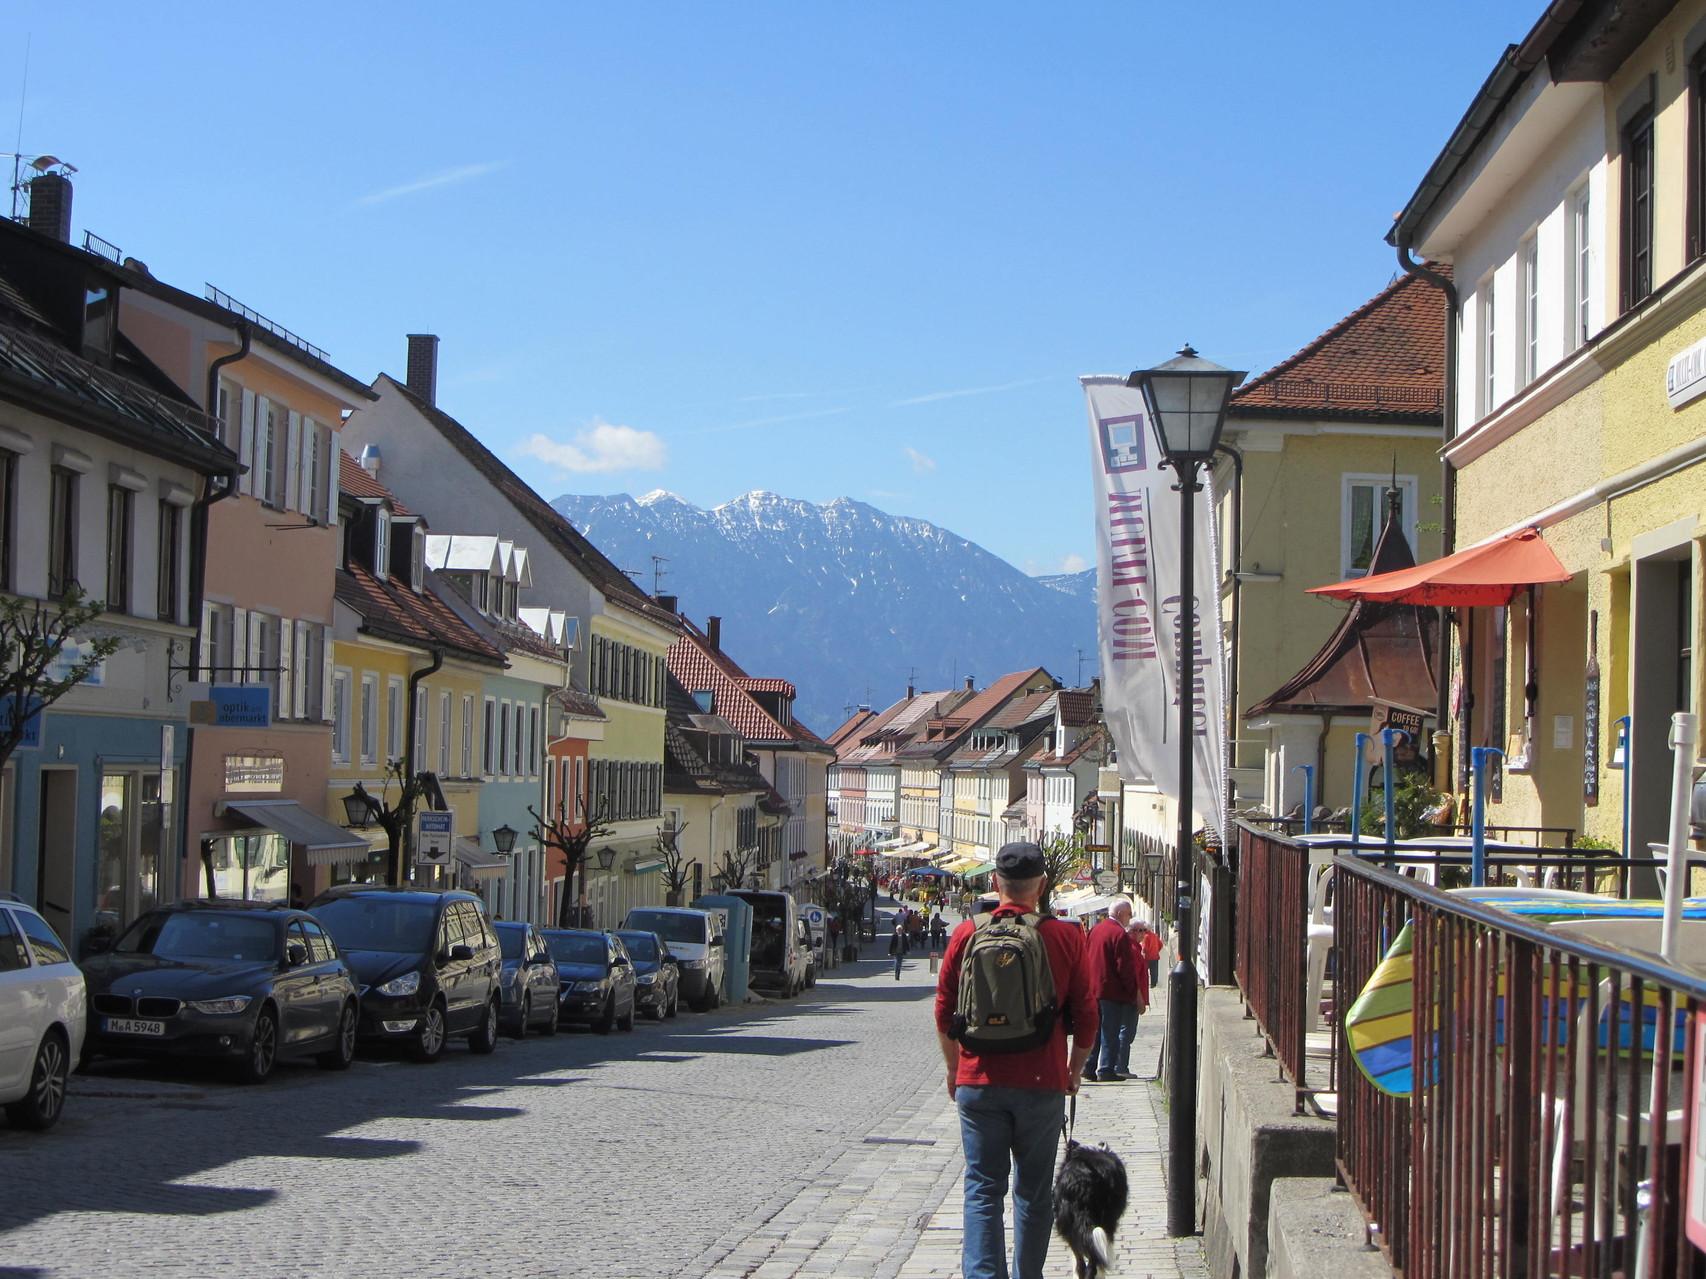 Bummel durch Murnau